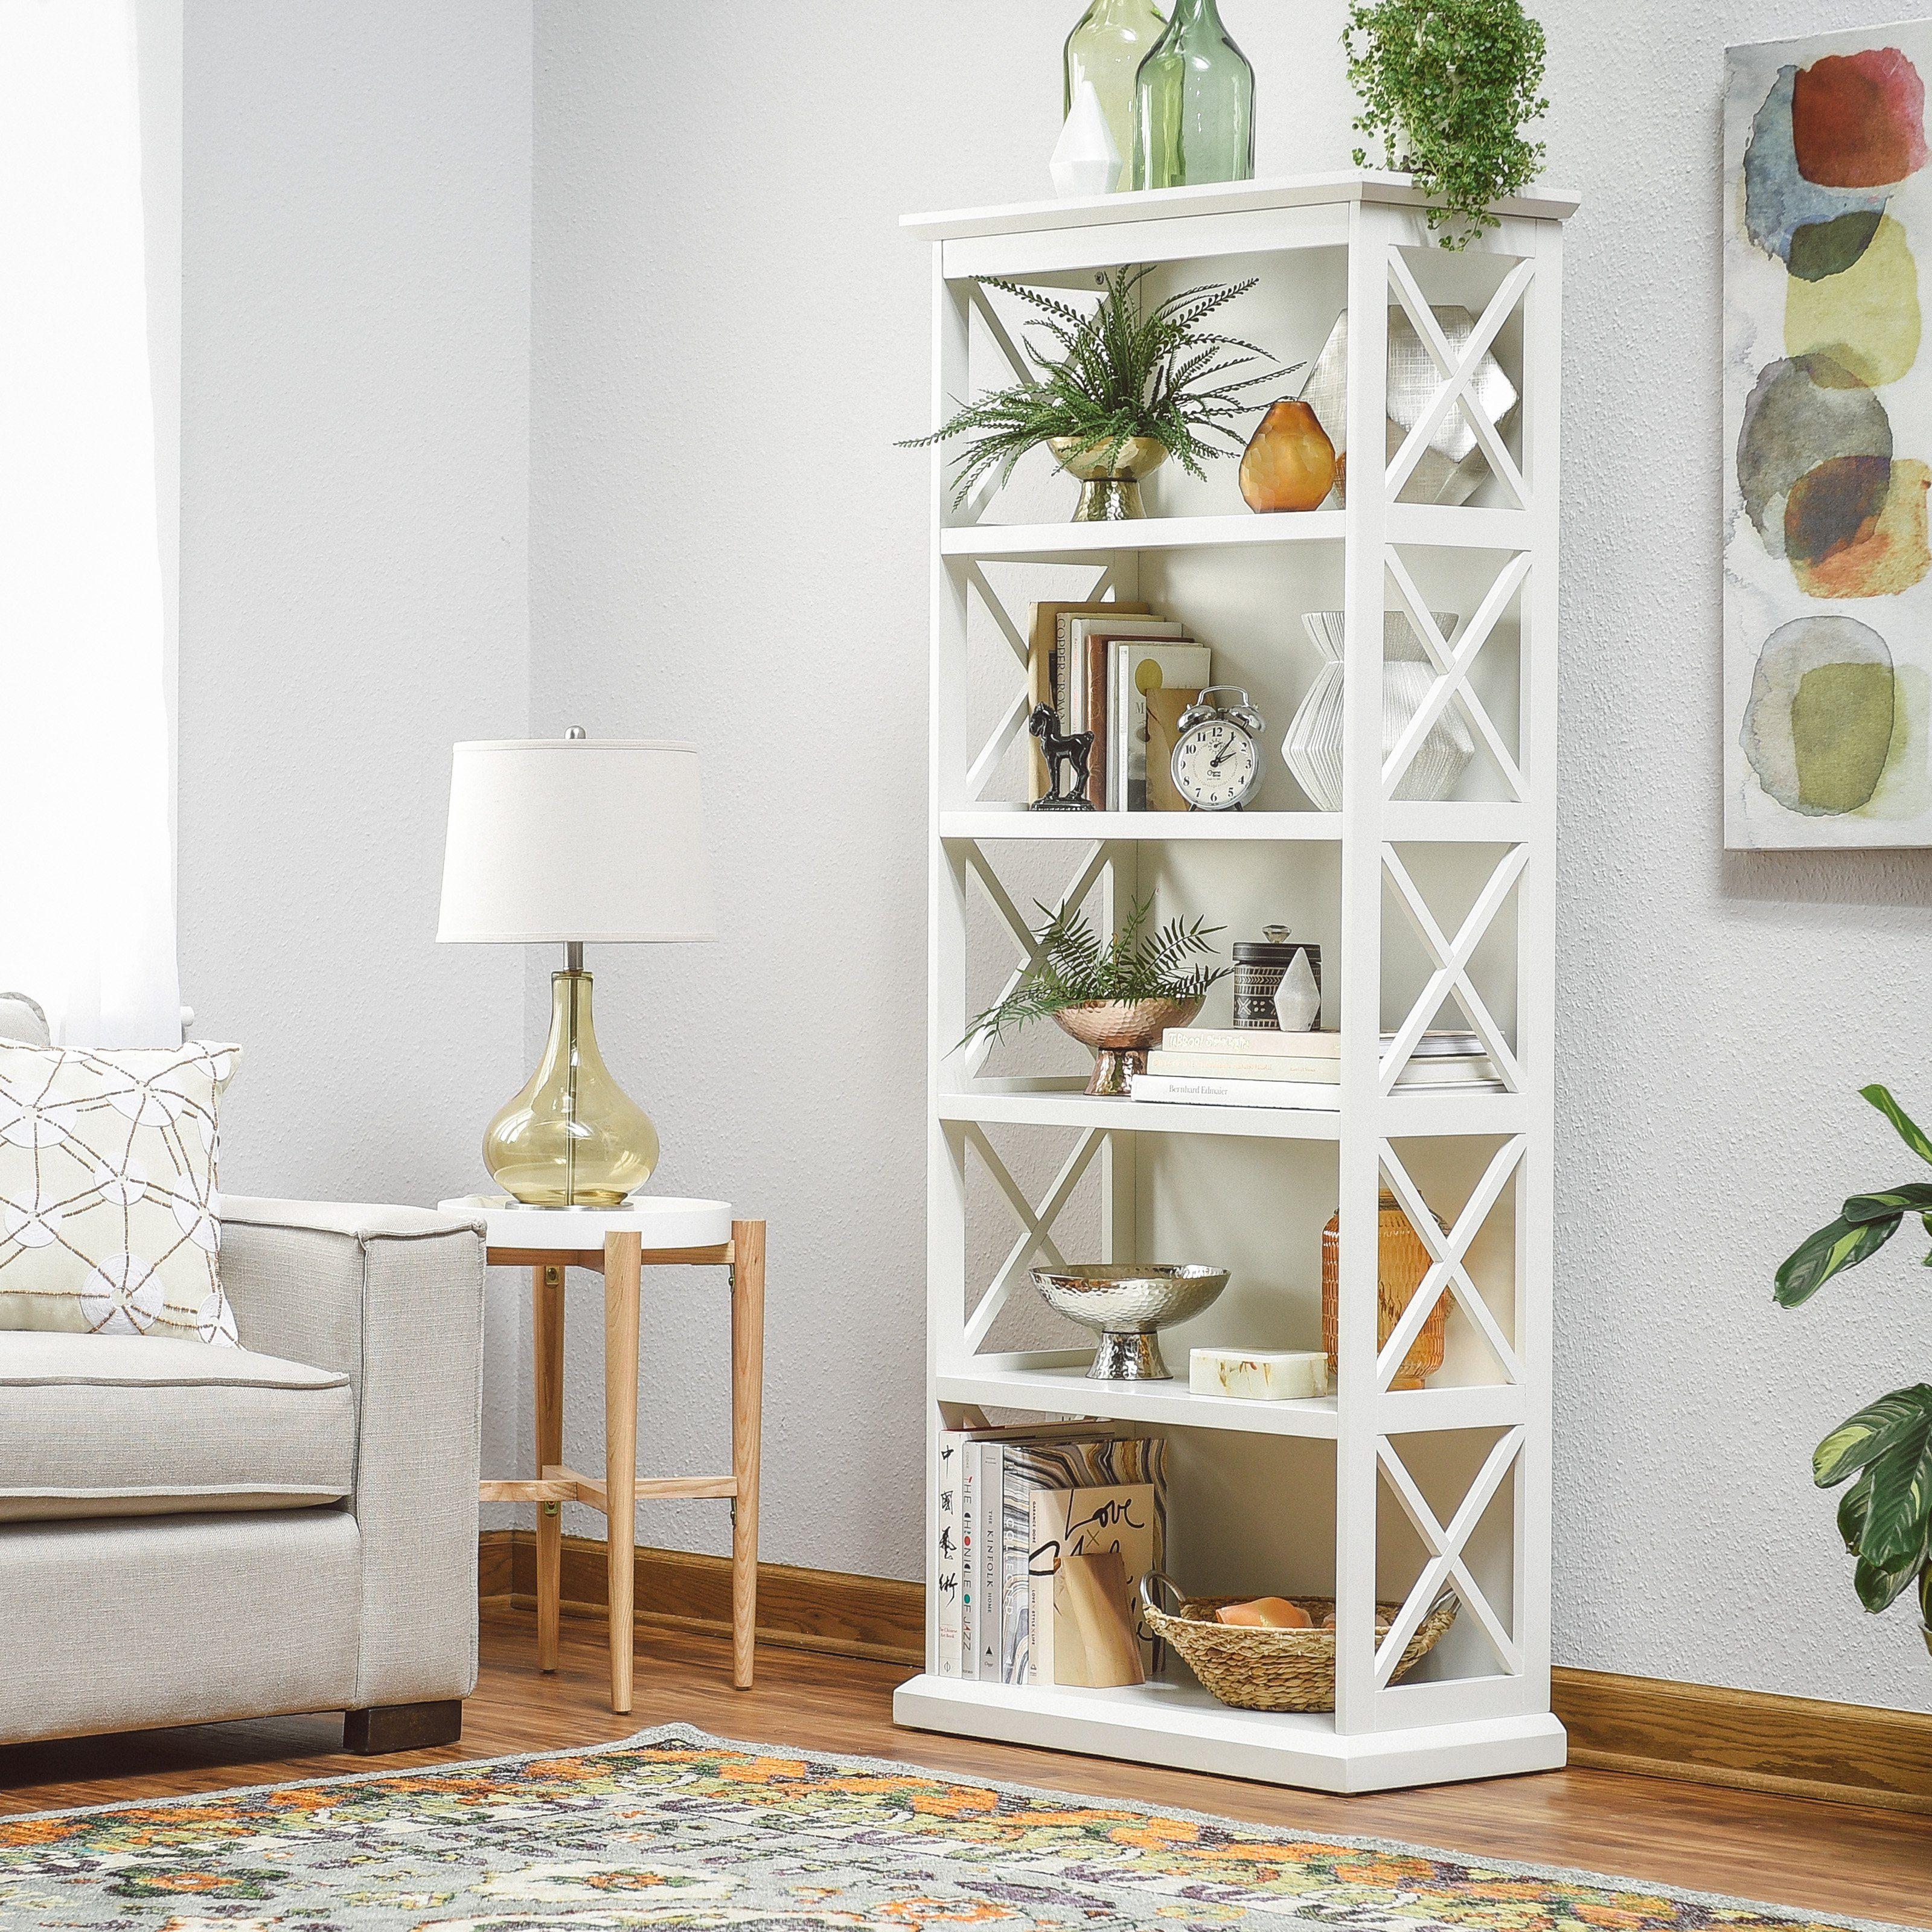 Belham Living Hampton 5-Tier Bookcase - White - KG216A-R1 W ...